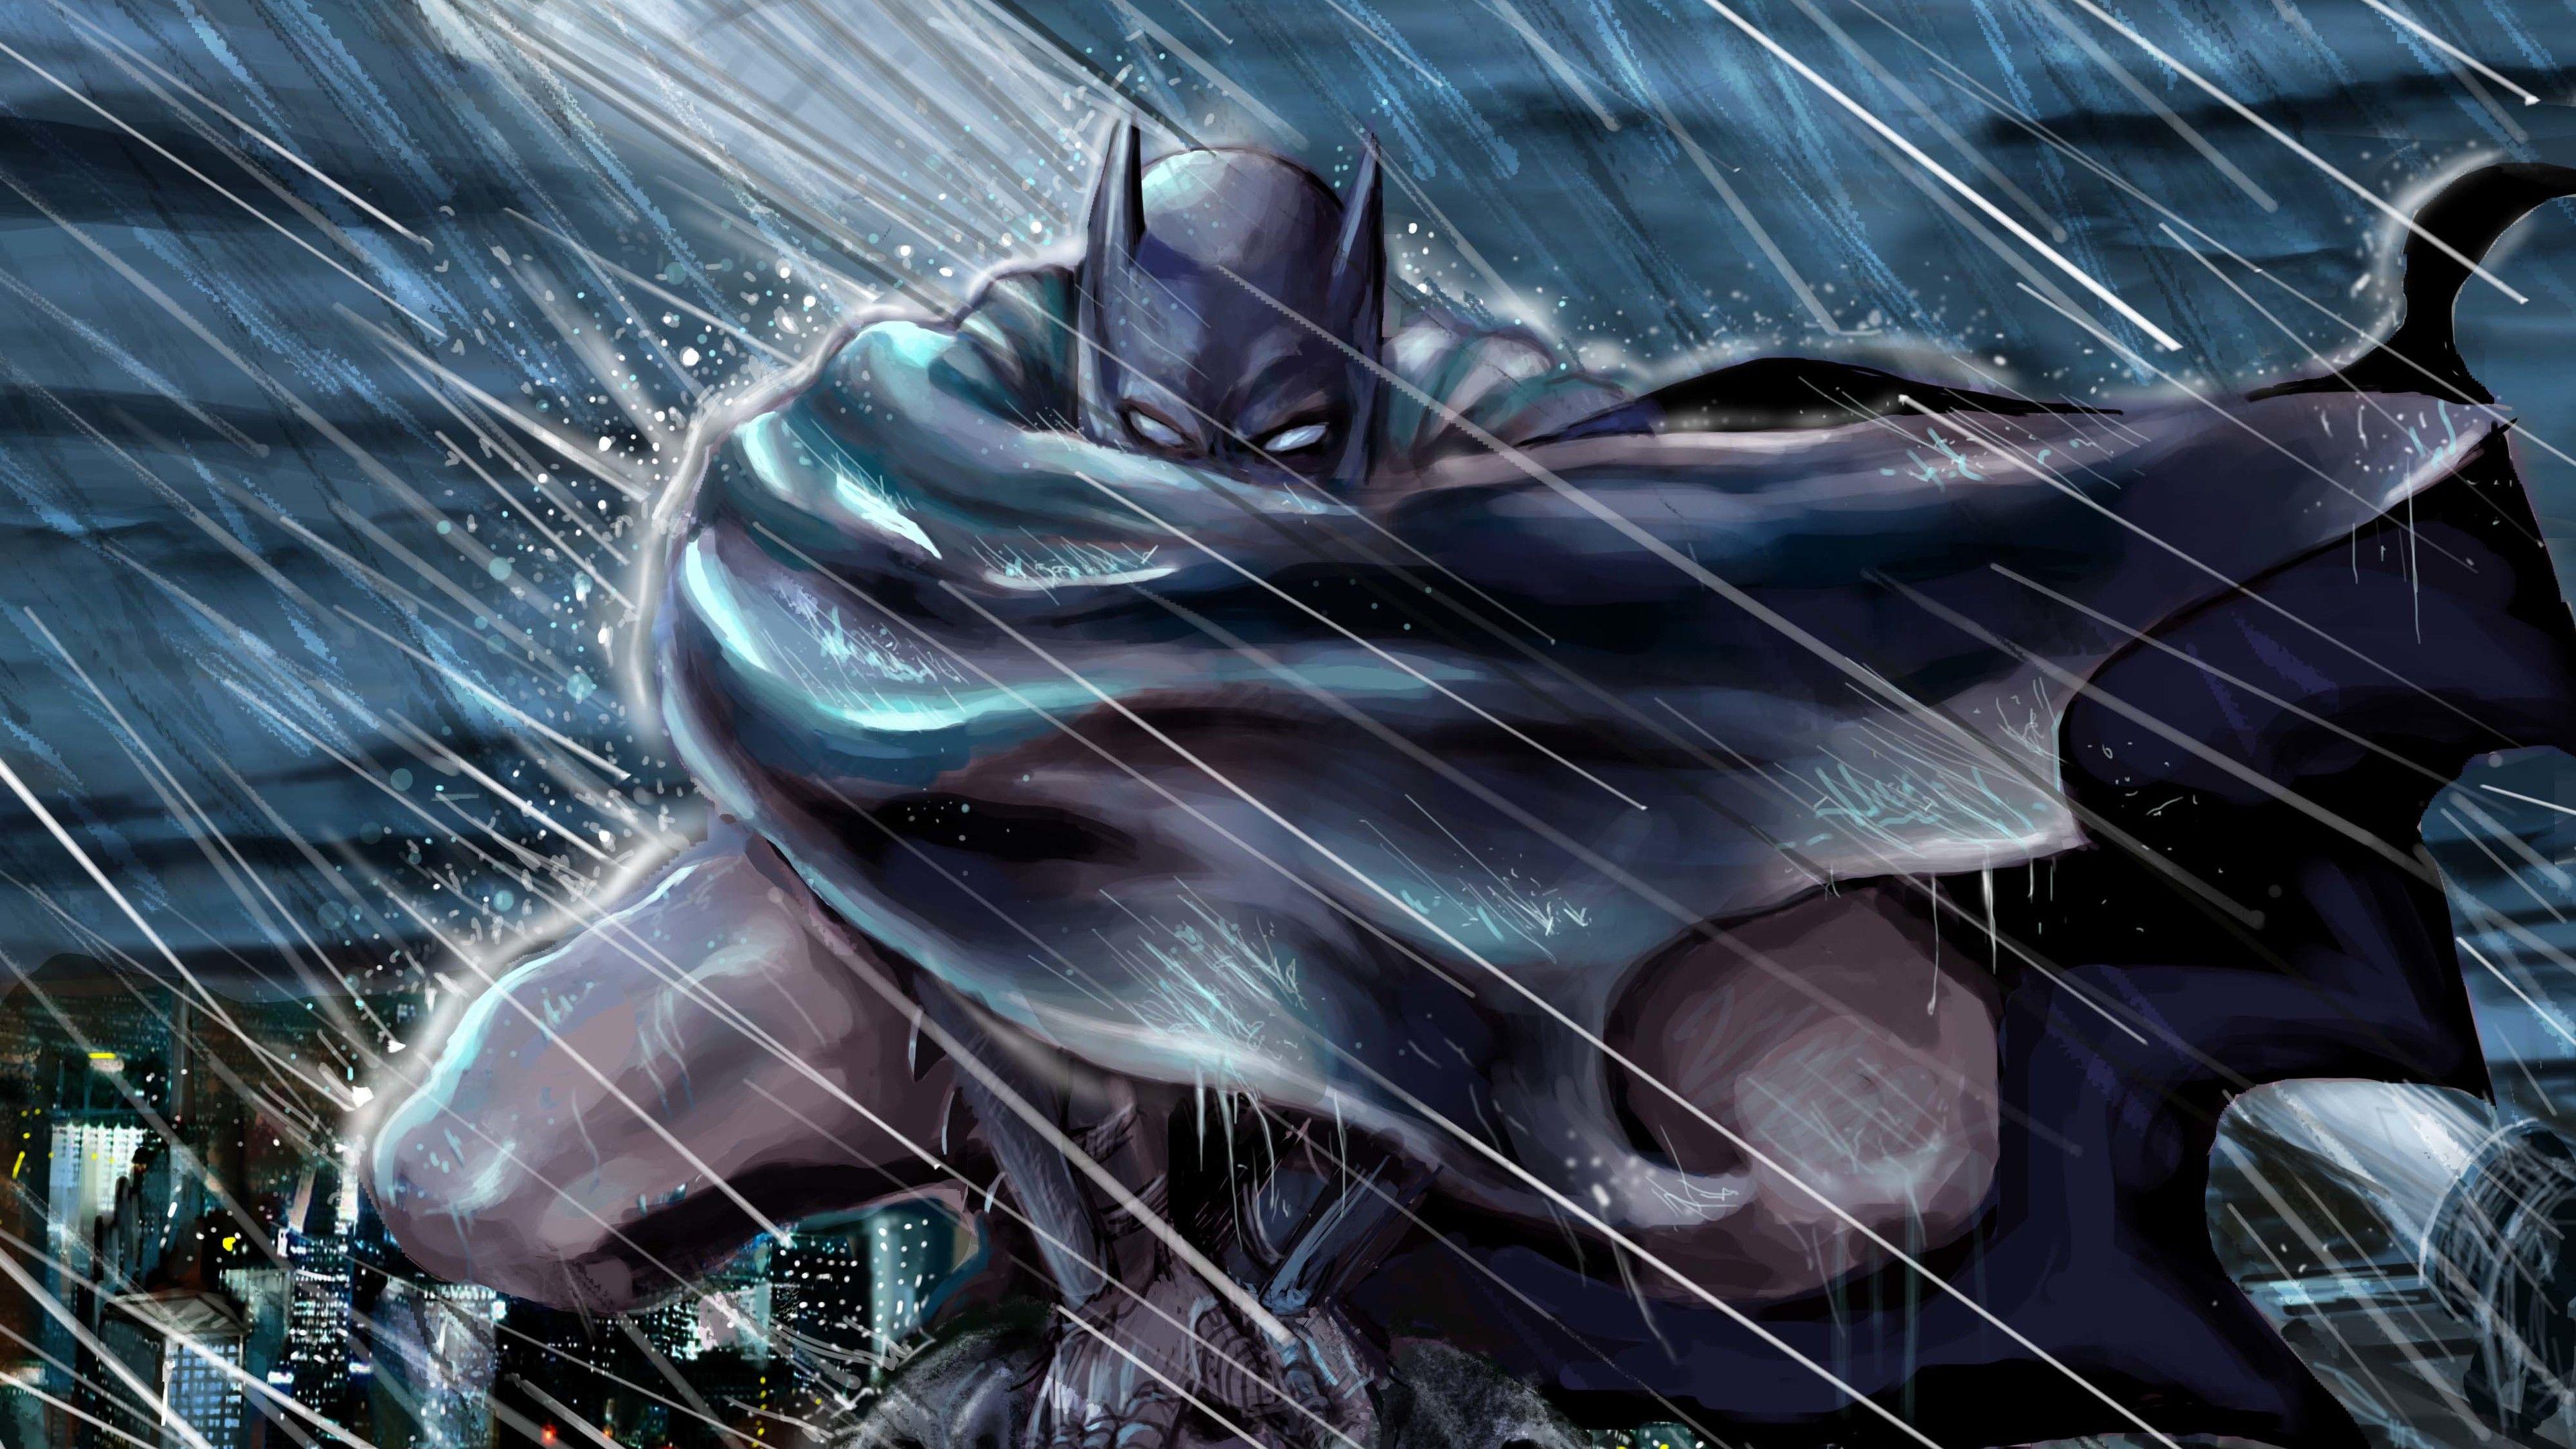 Batman Gotham Roof Top Protecter K Superheroes Wallpapers Hd Wallpapers Digital Art Wallpapers